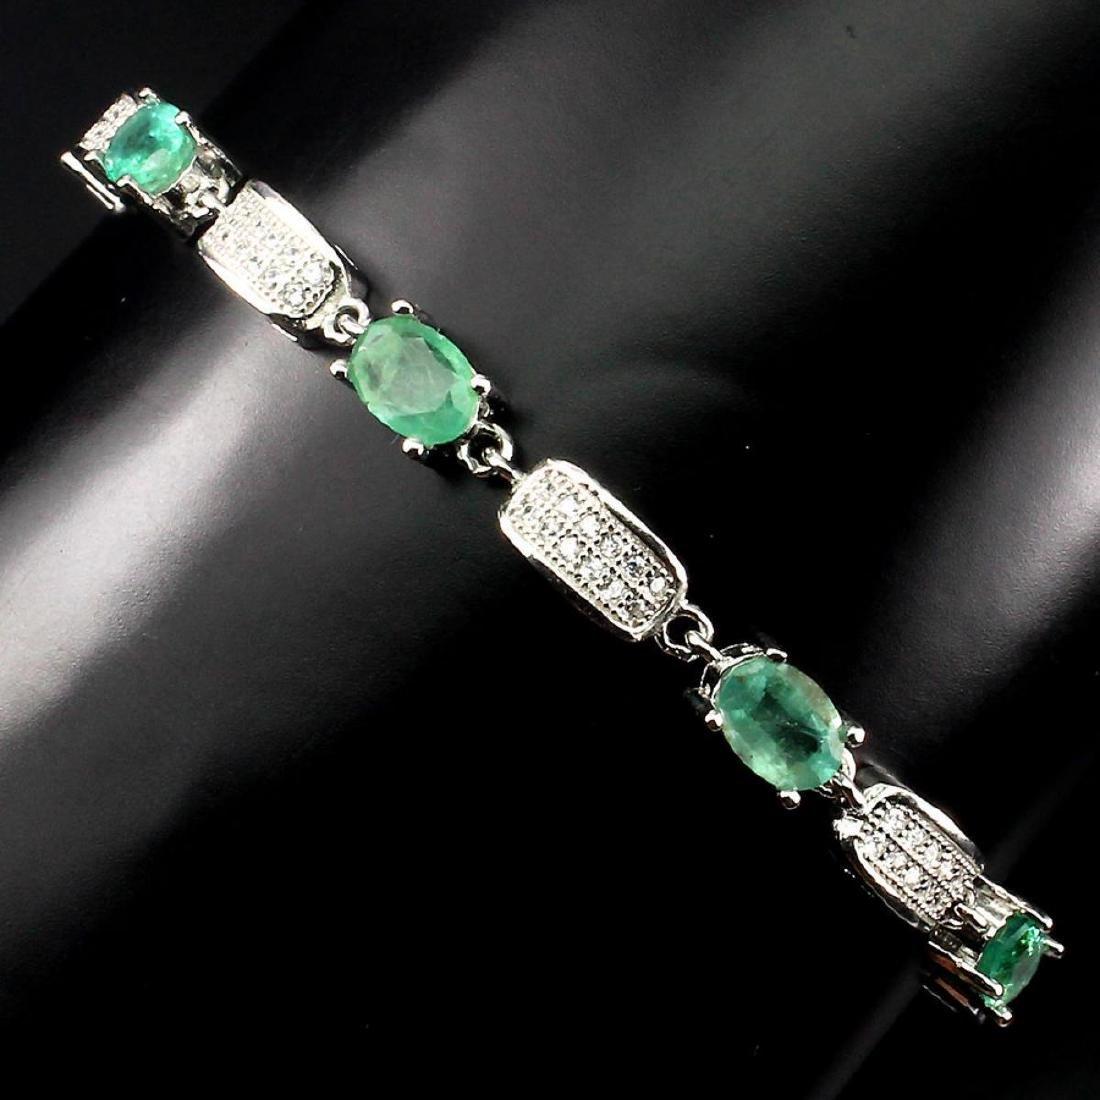 Natural Green Emerald 59 carats Bracelet - 2